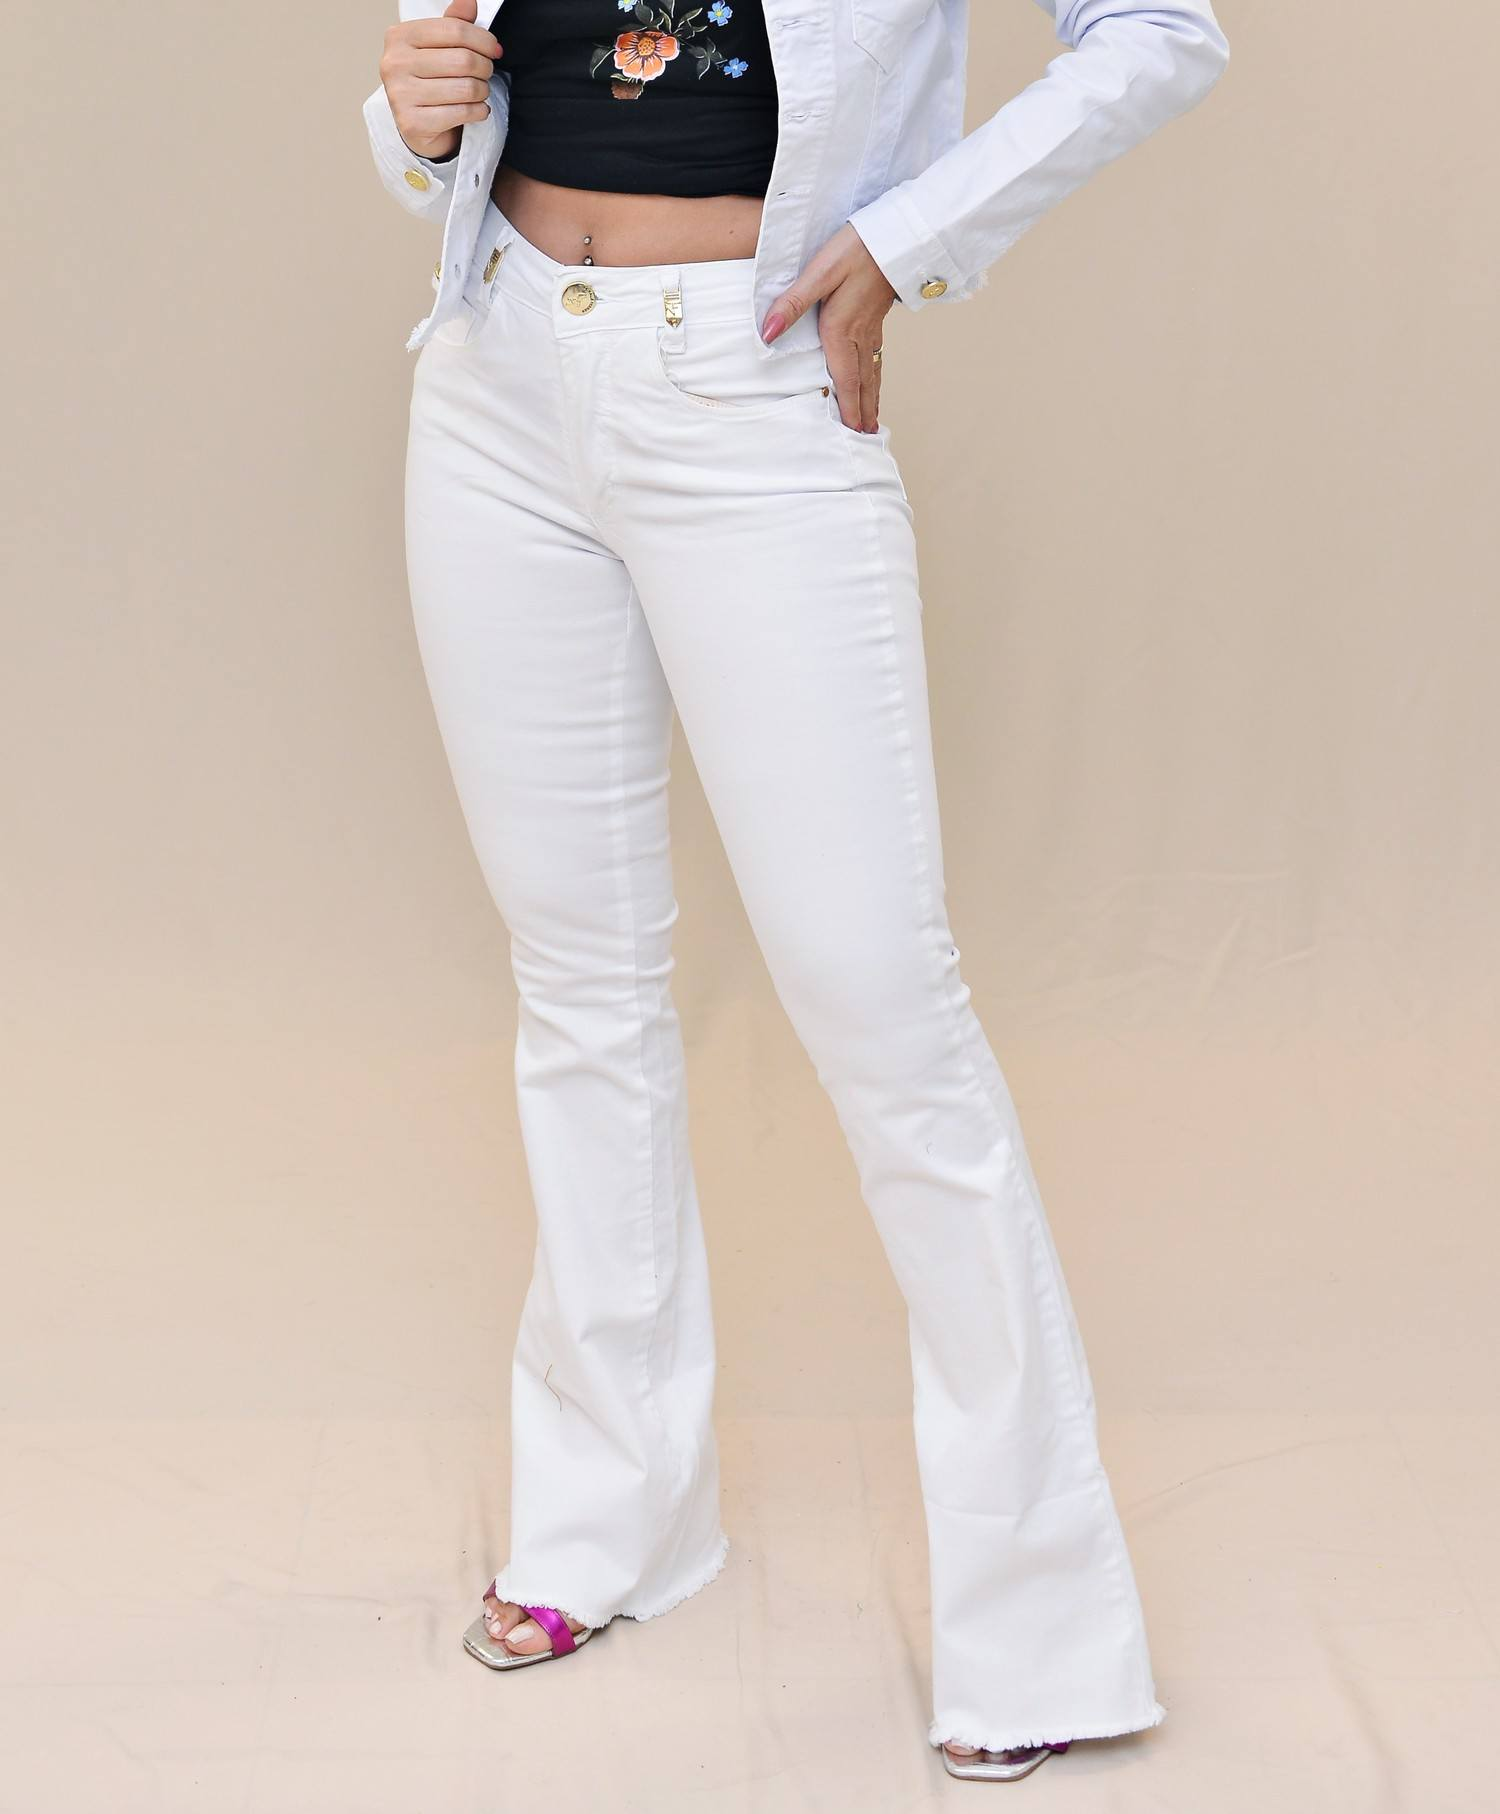 Calça Jeans Flare Branca Nathalie Ferrier